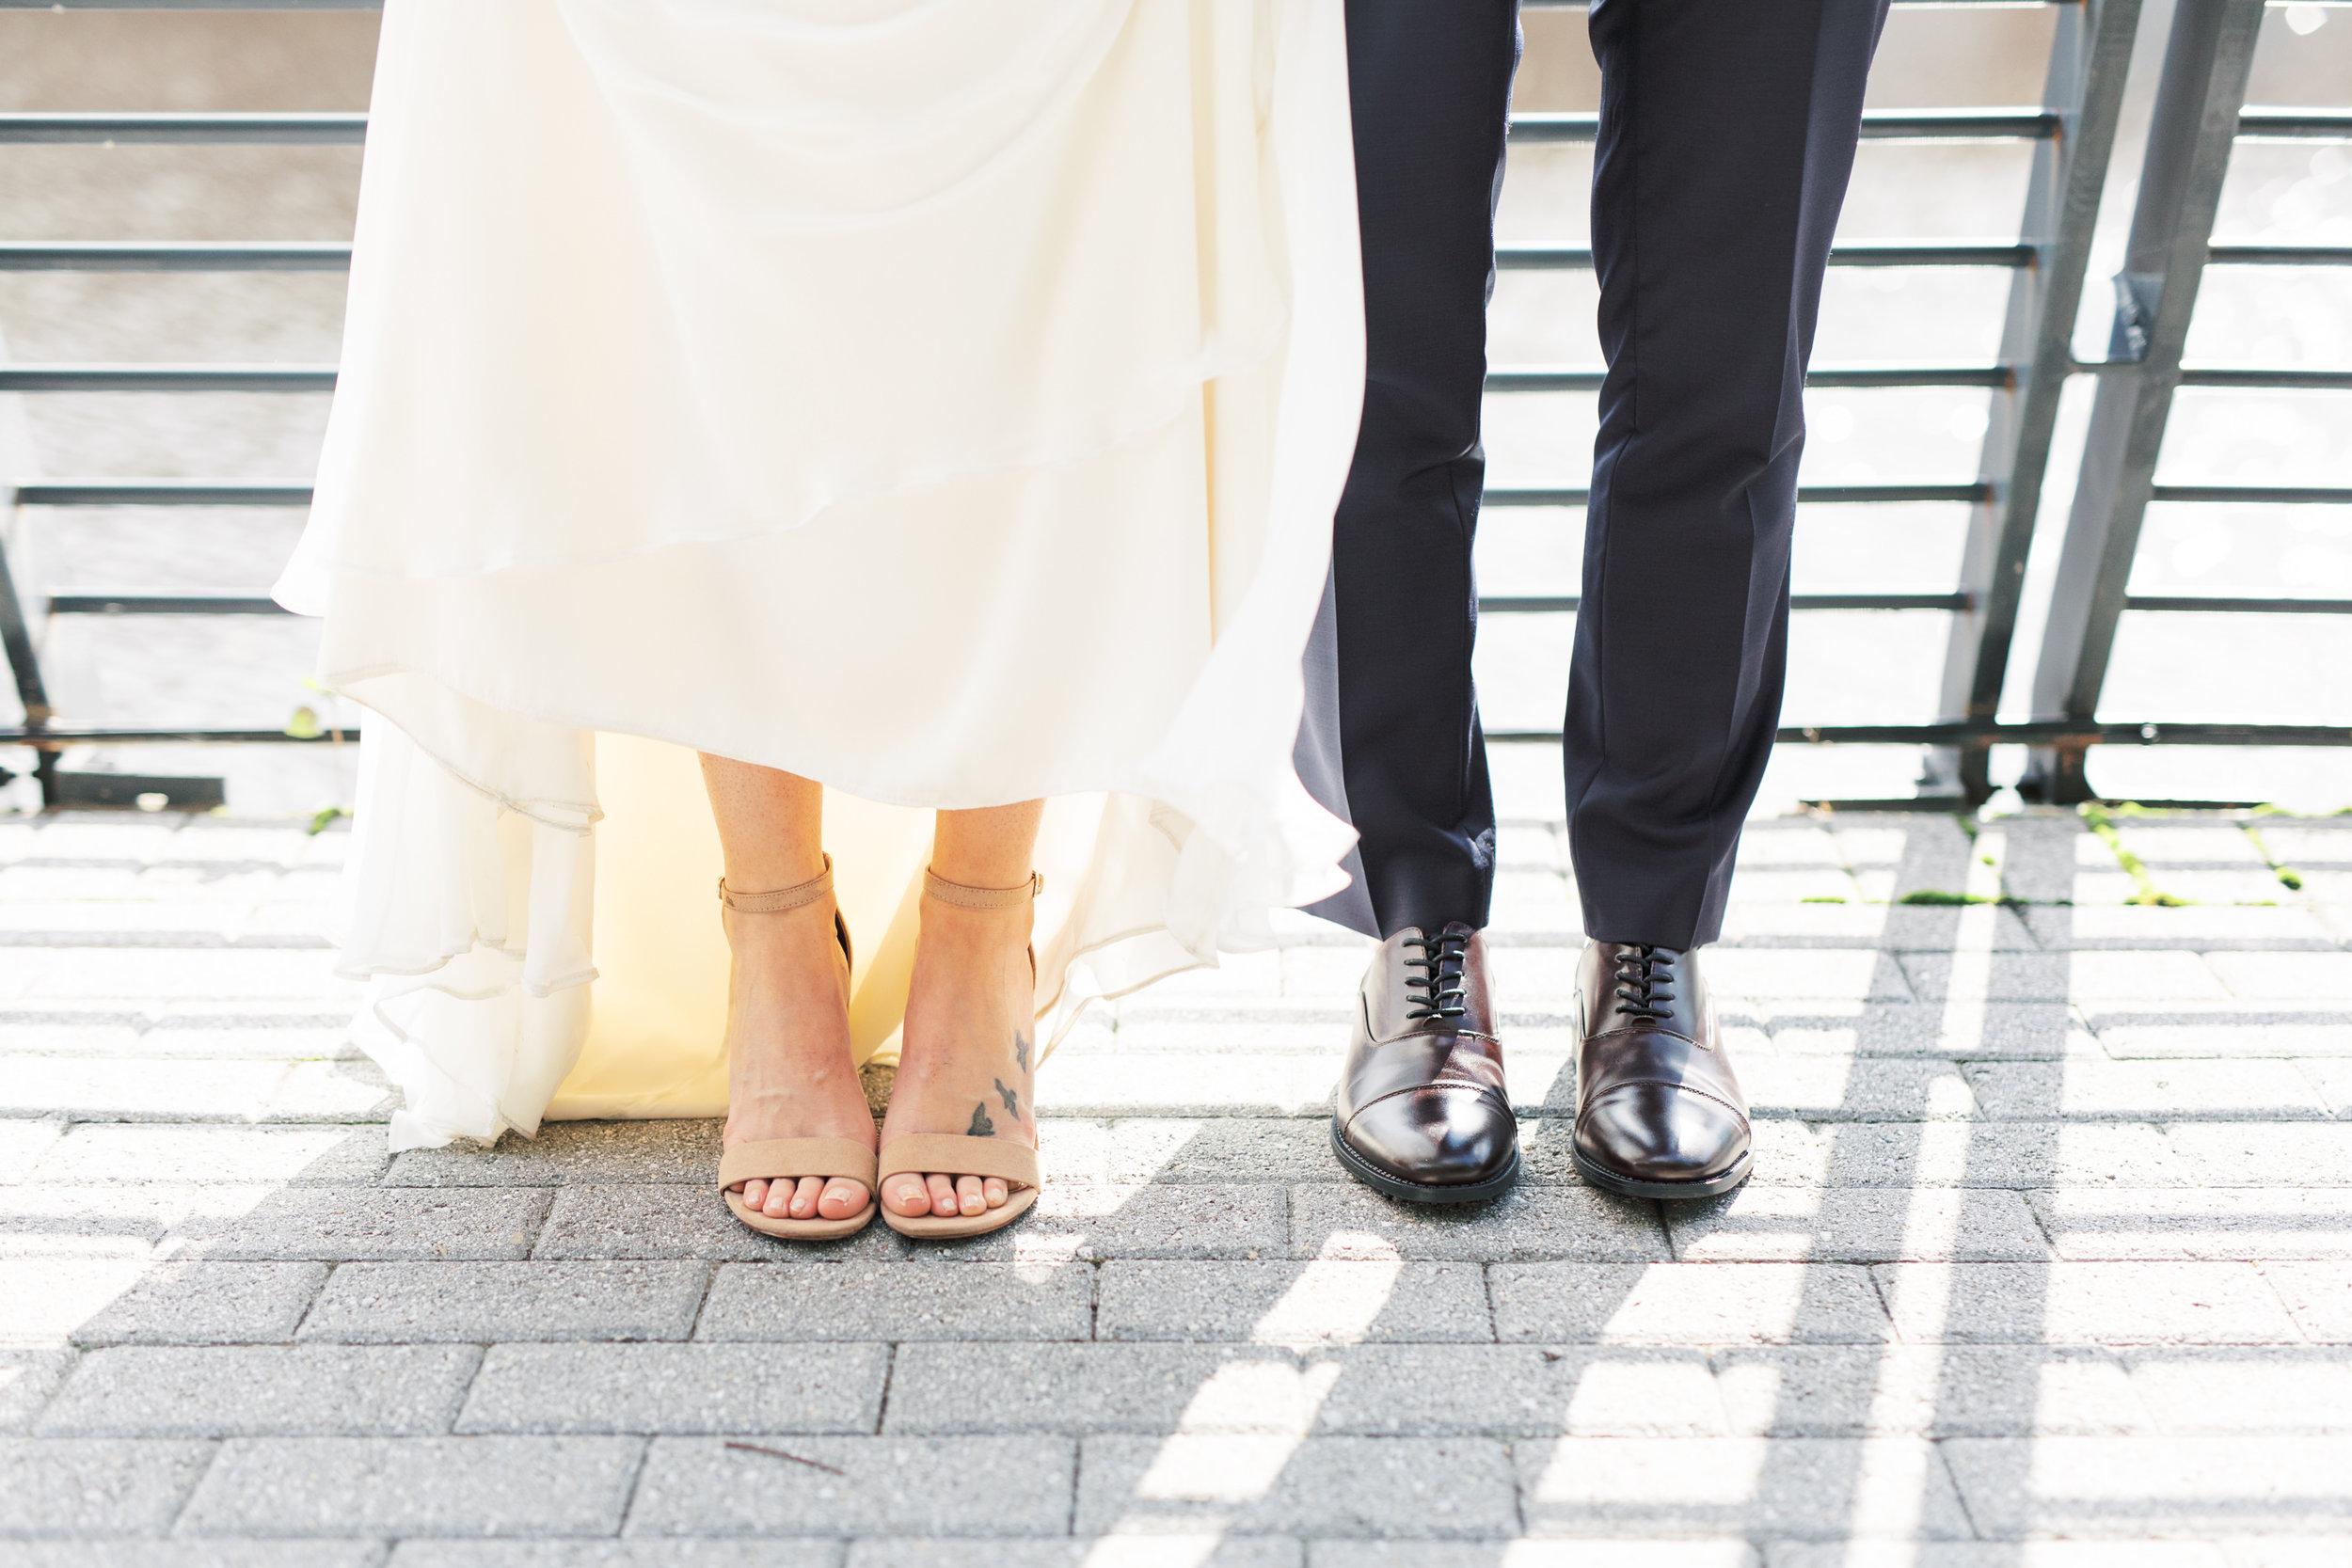 haley-richter-photography-keristin-wedding-same-sex-brides-philadelphia-photographer-modern-old-city-power-plant-productions-67.jpg